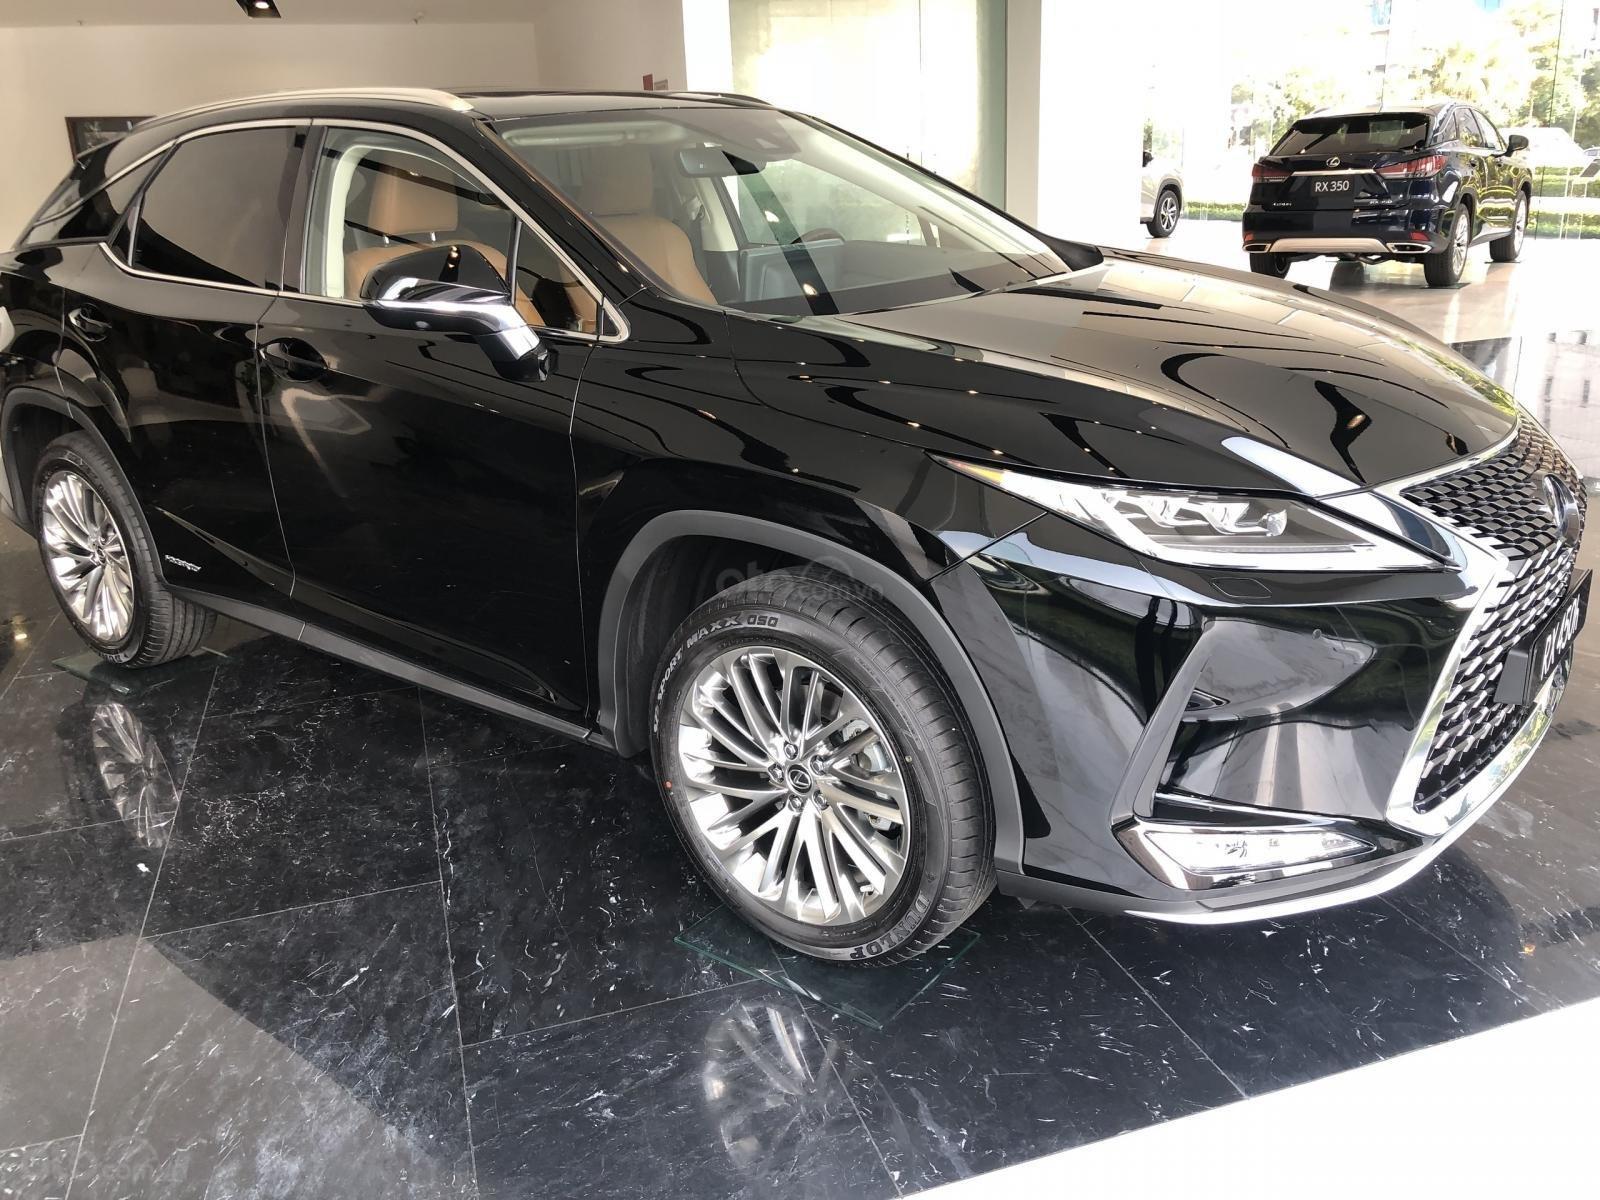 Bán Lexus RX 450h 2020, màu đen, nhập khẩu (2)